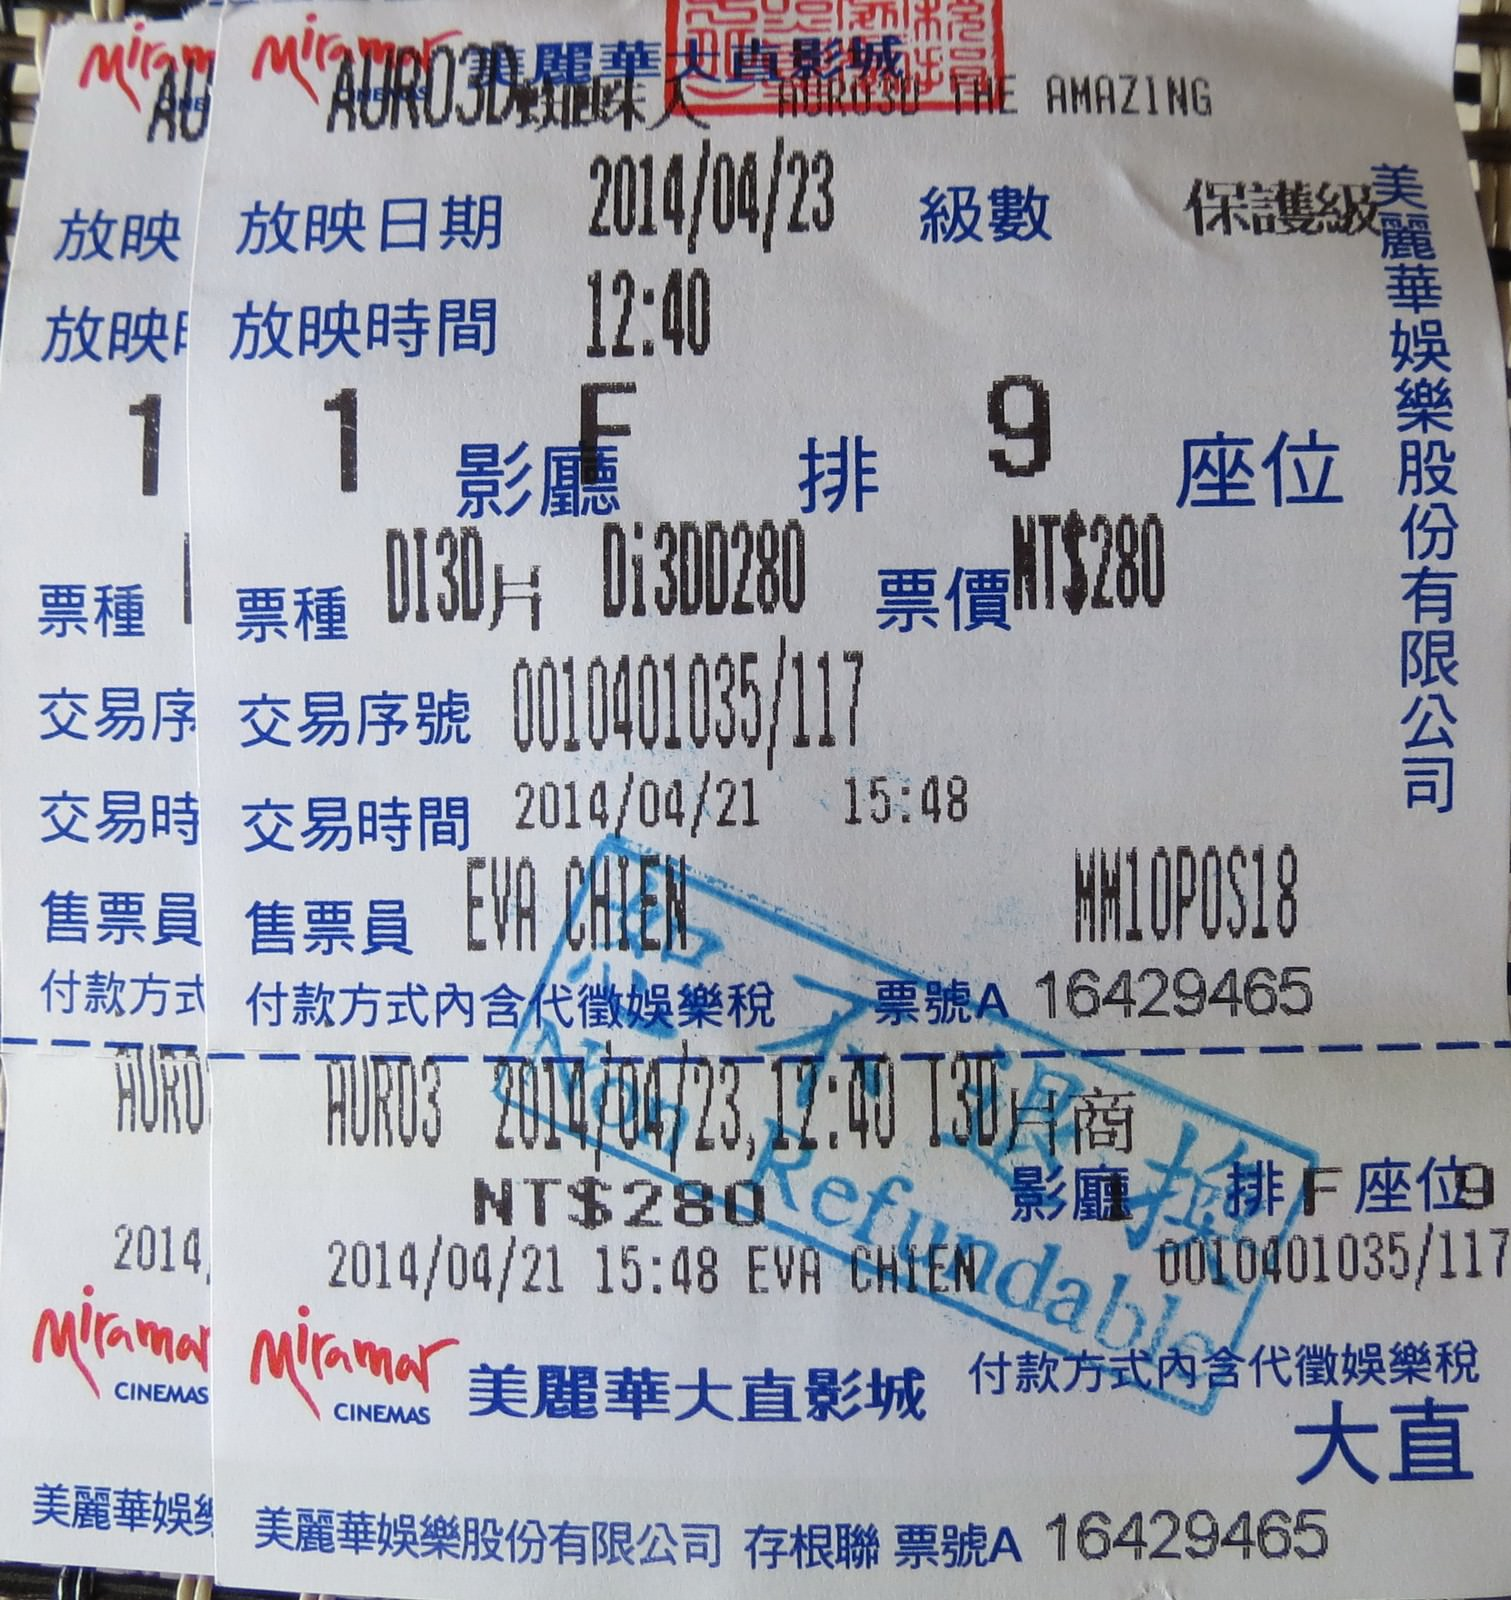 Movie, The Amazing Spider-Man 2(美國) / 蜘蛛人驚奇再起2:電光之戰(台) / 超凡蜘蛛侠2(中) / 蜘蛛俠2:決戰電魔(港), 電影票(特映會)